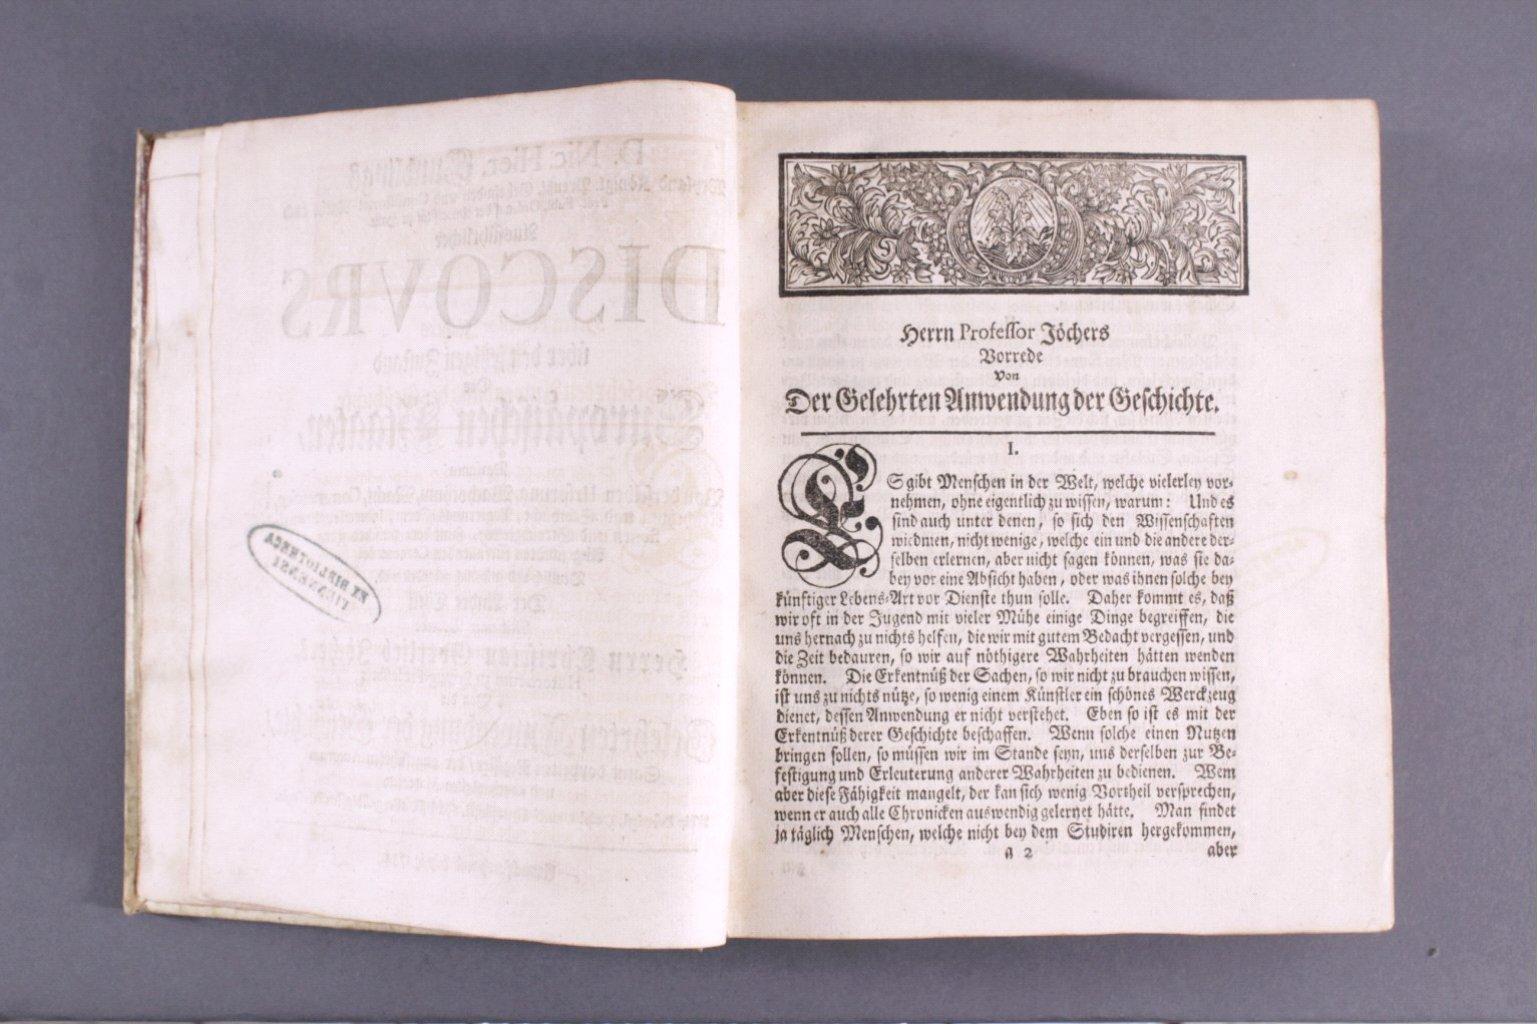 D. Nic. Hier Gundlings Discours, 1734-3